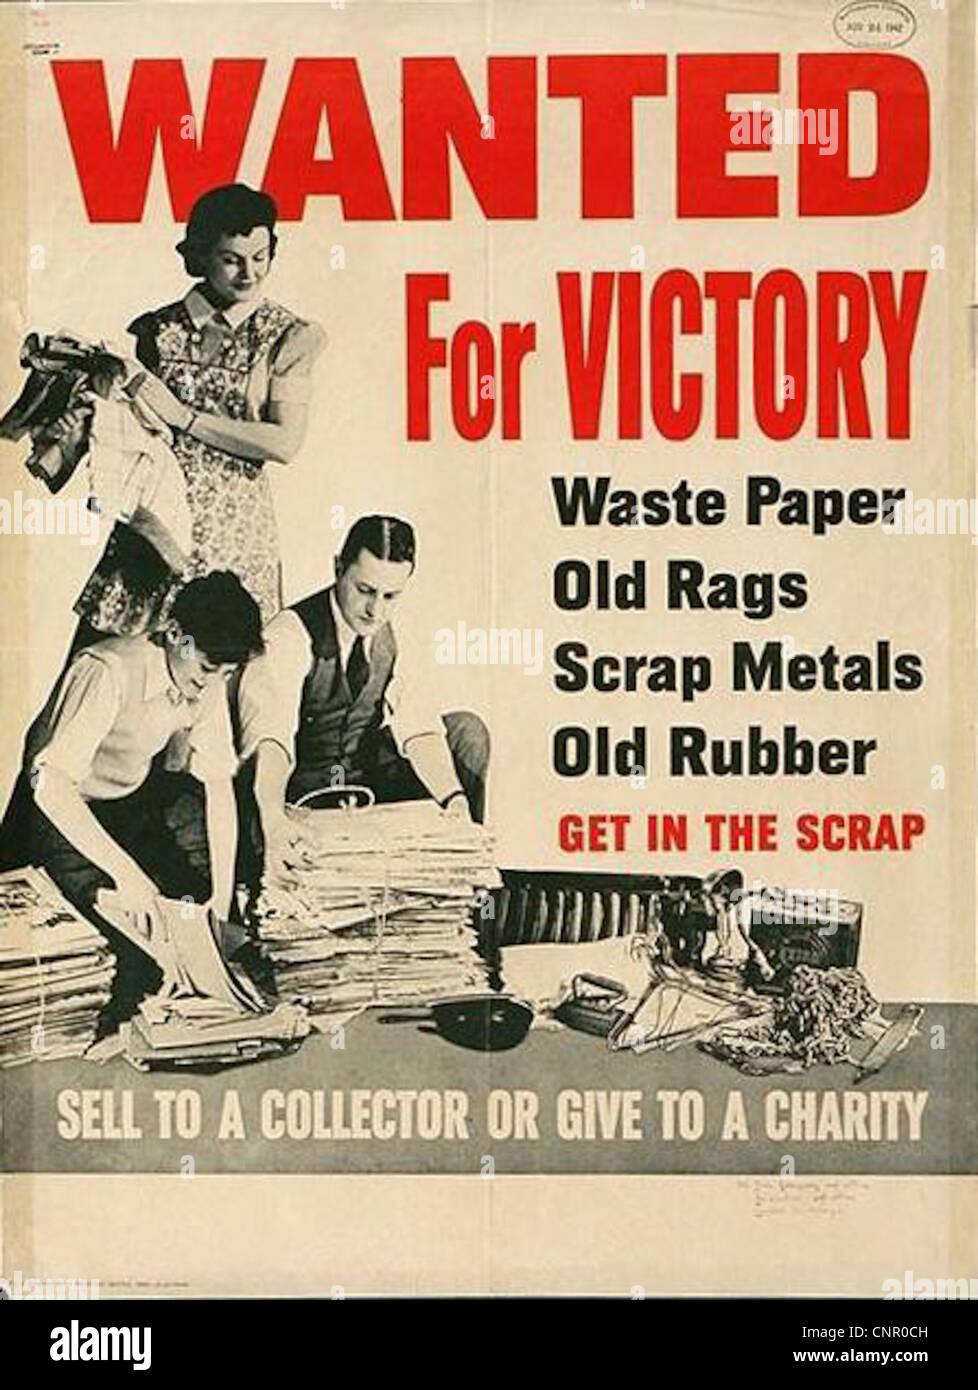 World War 2 Propaganda Posters - Stock Image